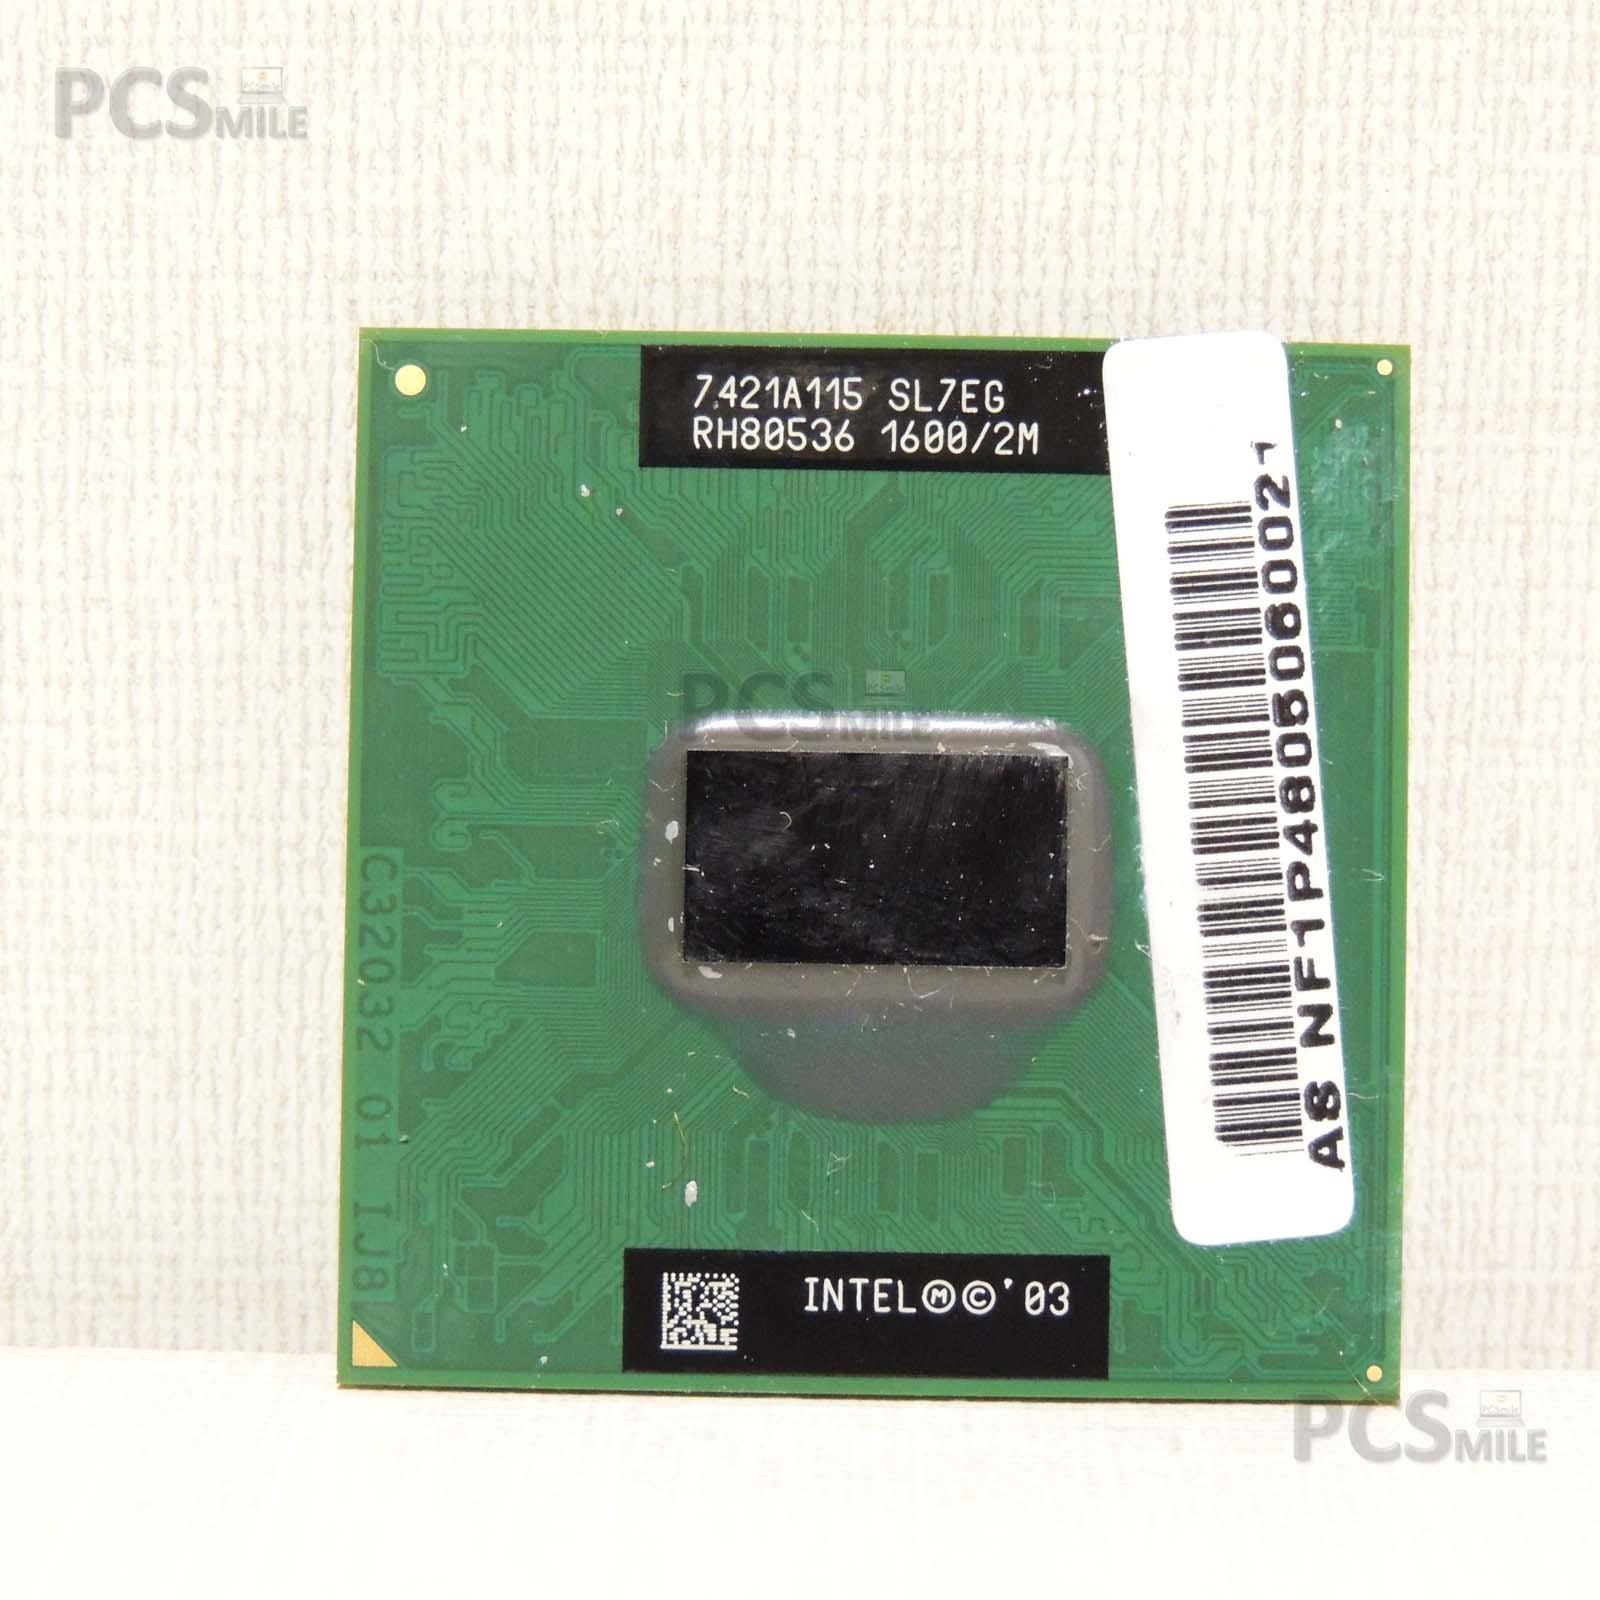 Intel® Pentium® M Processor 725 (2M Cache, 1.60A GHz, 400 MHz FSB) SL7EG